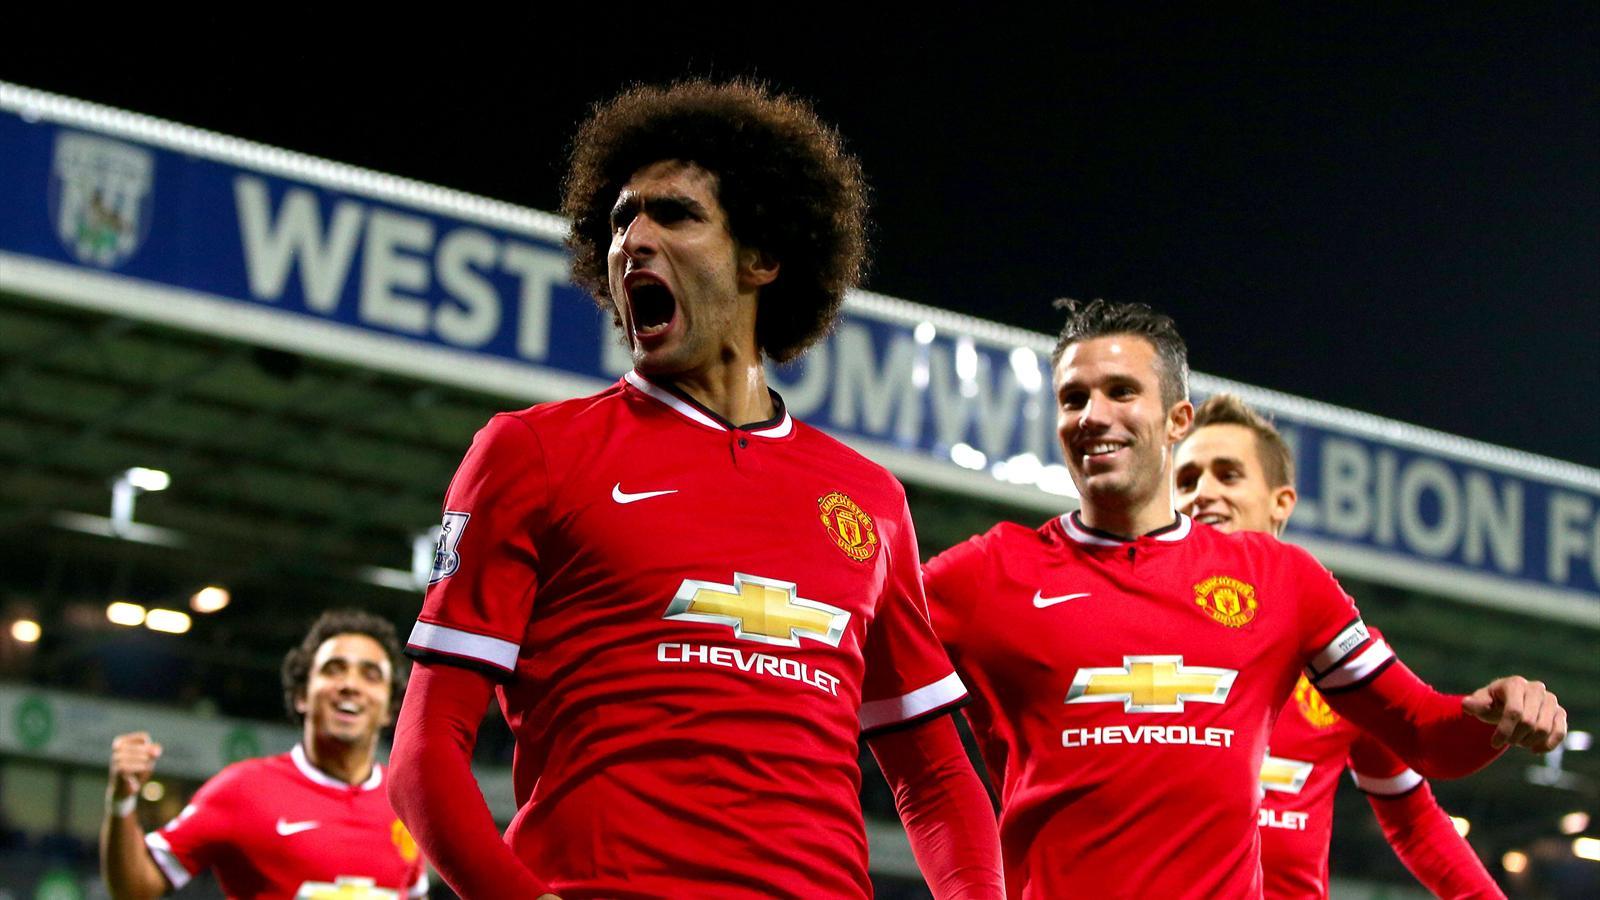 Fellaini celebrates scoring a cracker against West Bromwich